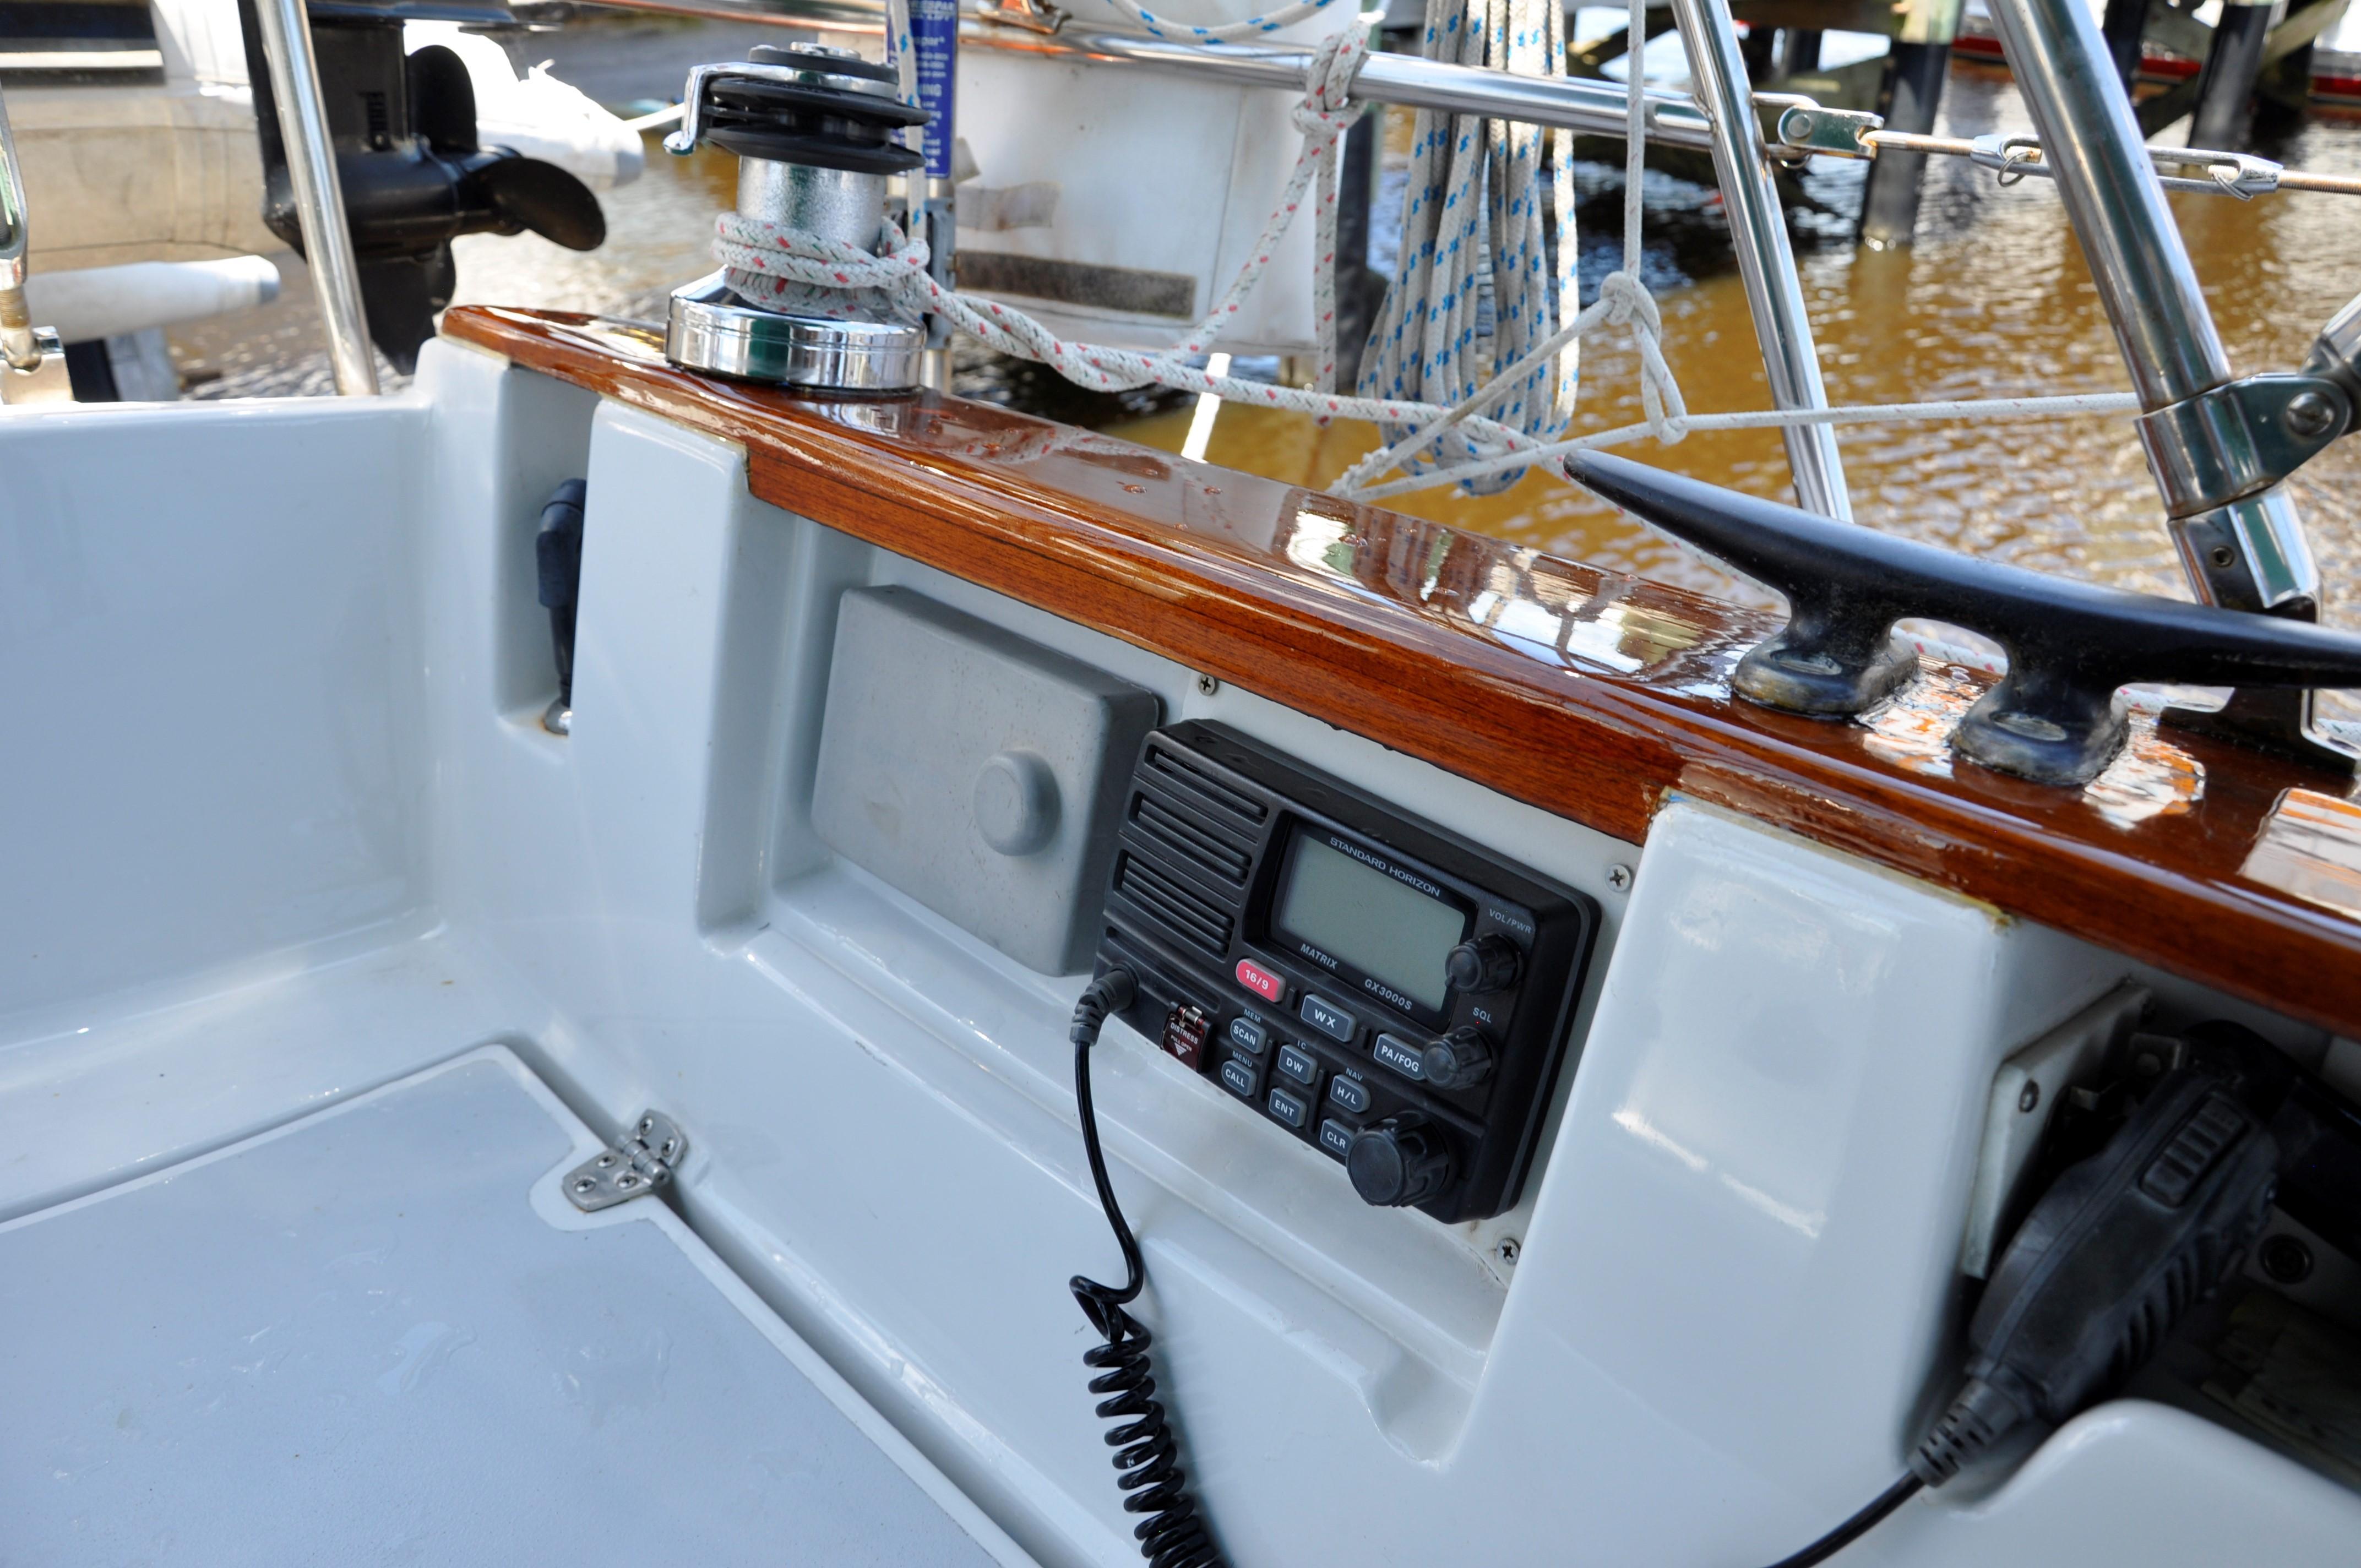 Cockpit VHF